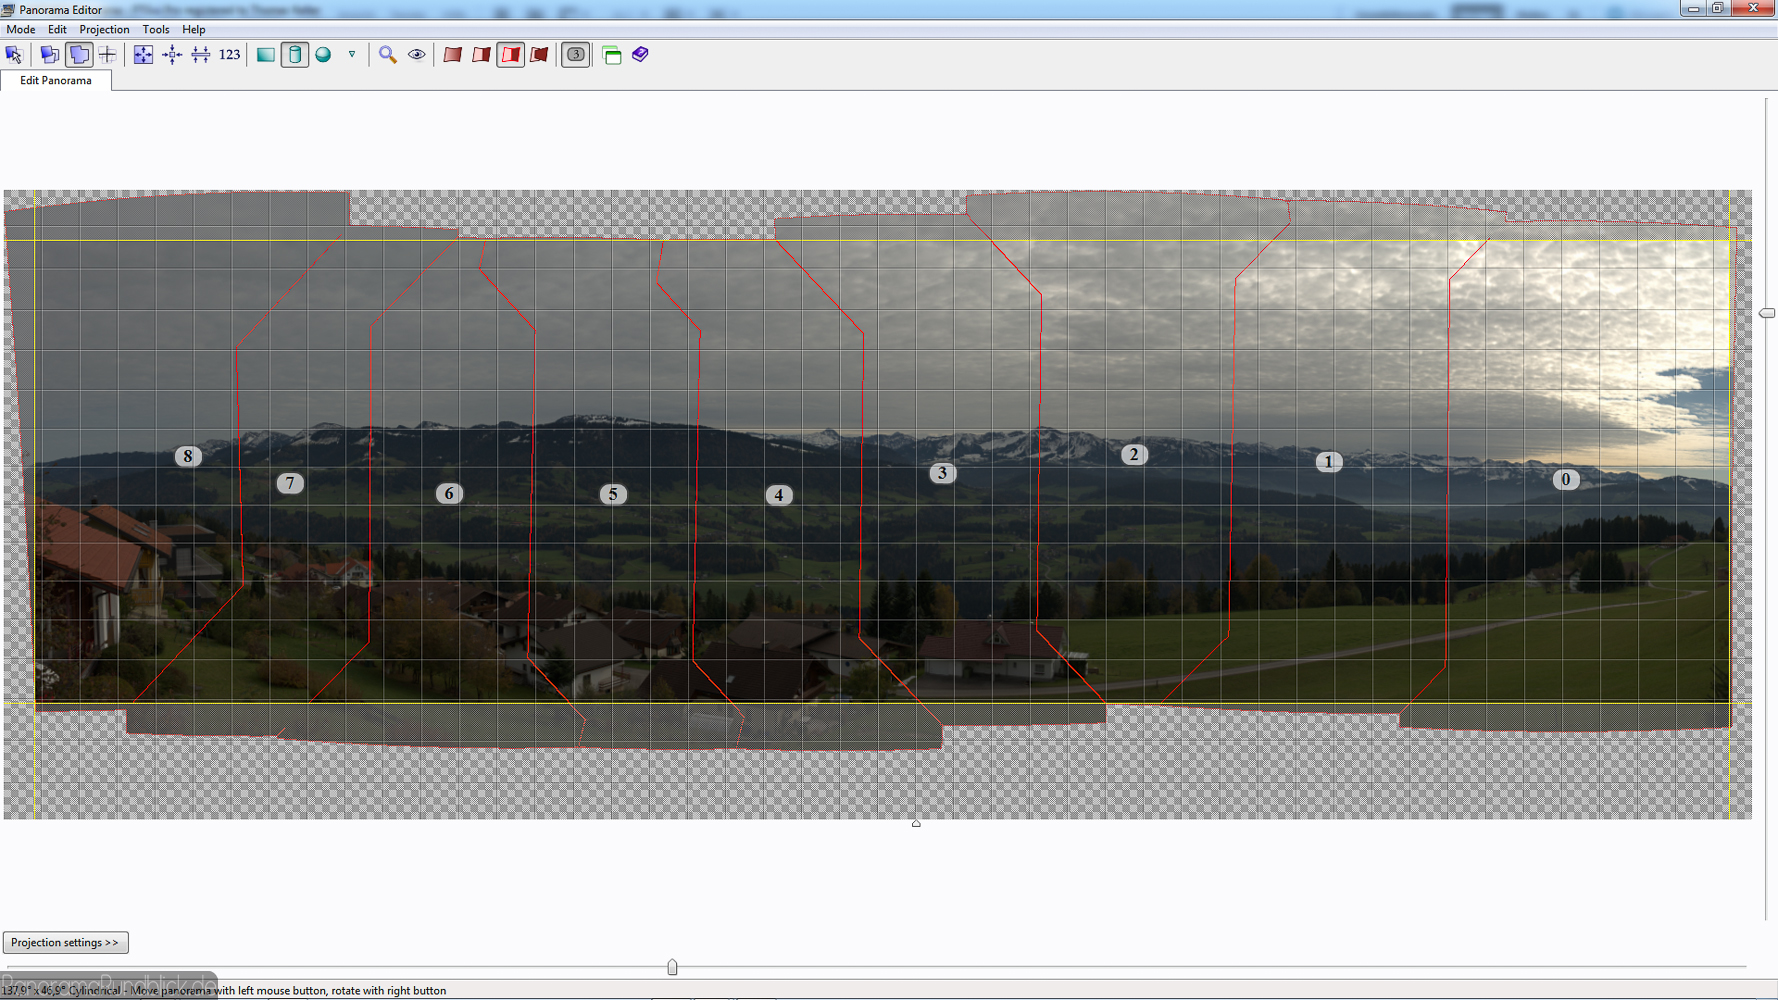 Vorschau Edit-Panorama